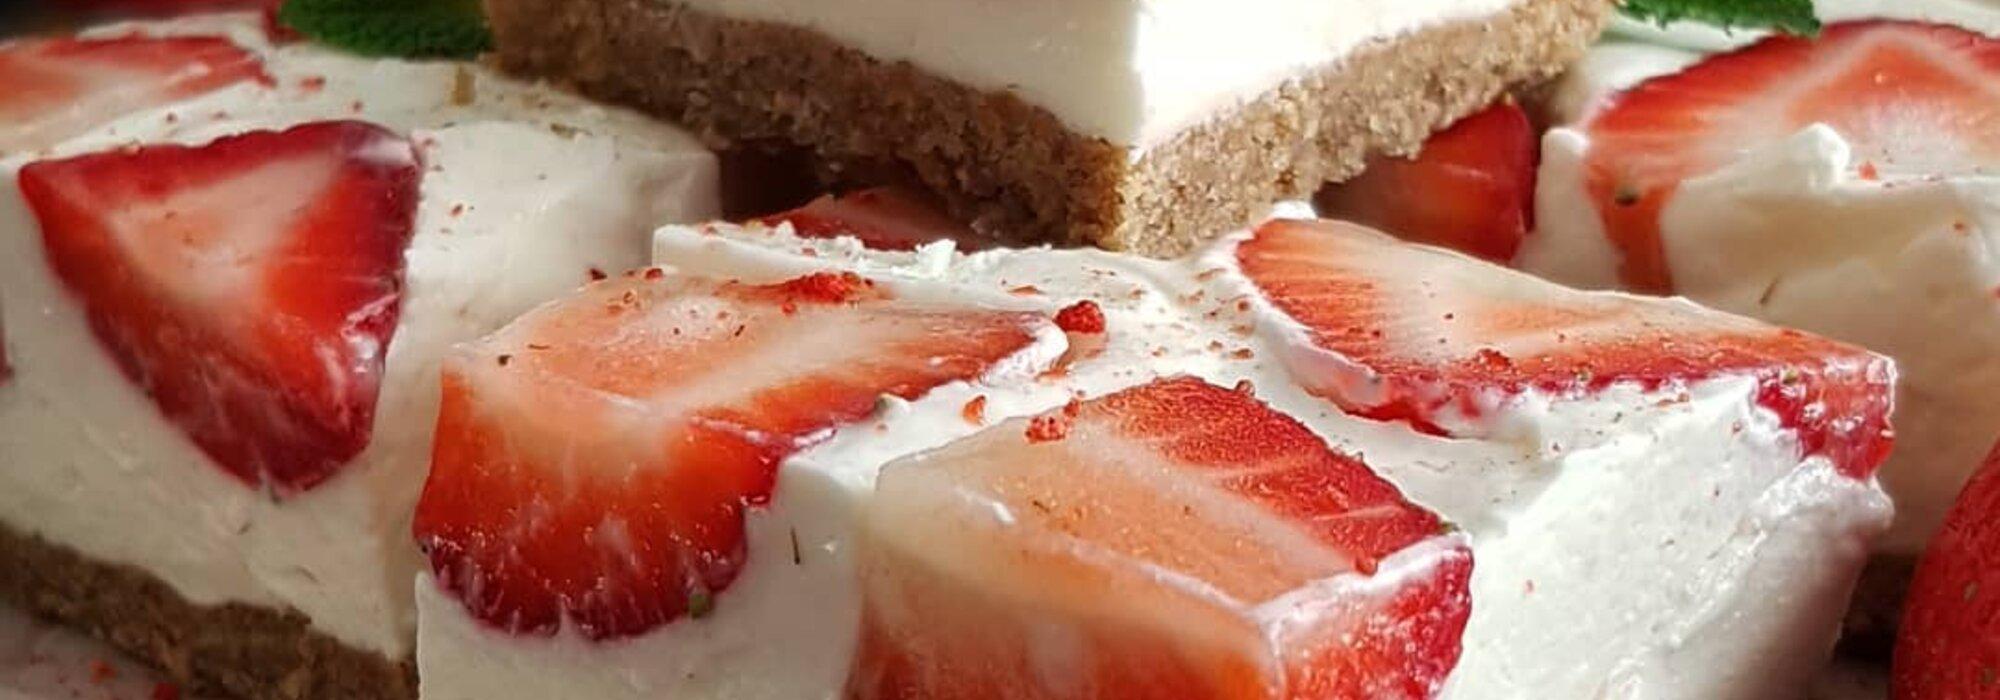 Suikervrije no bake strawberry cheesecake